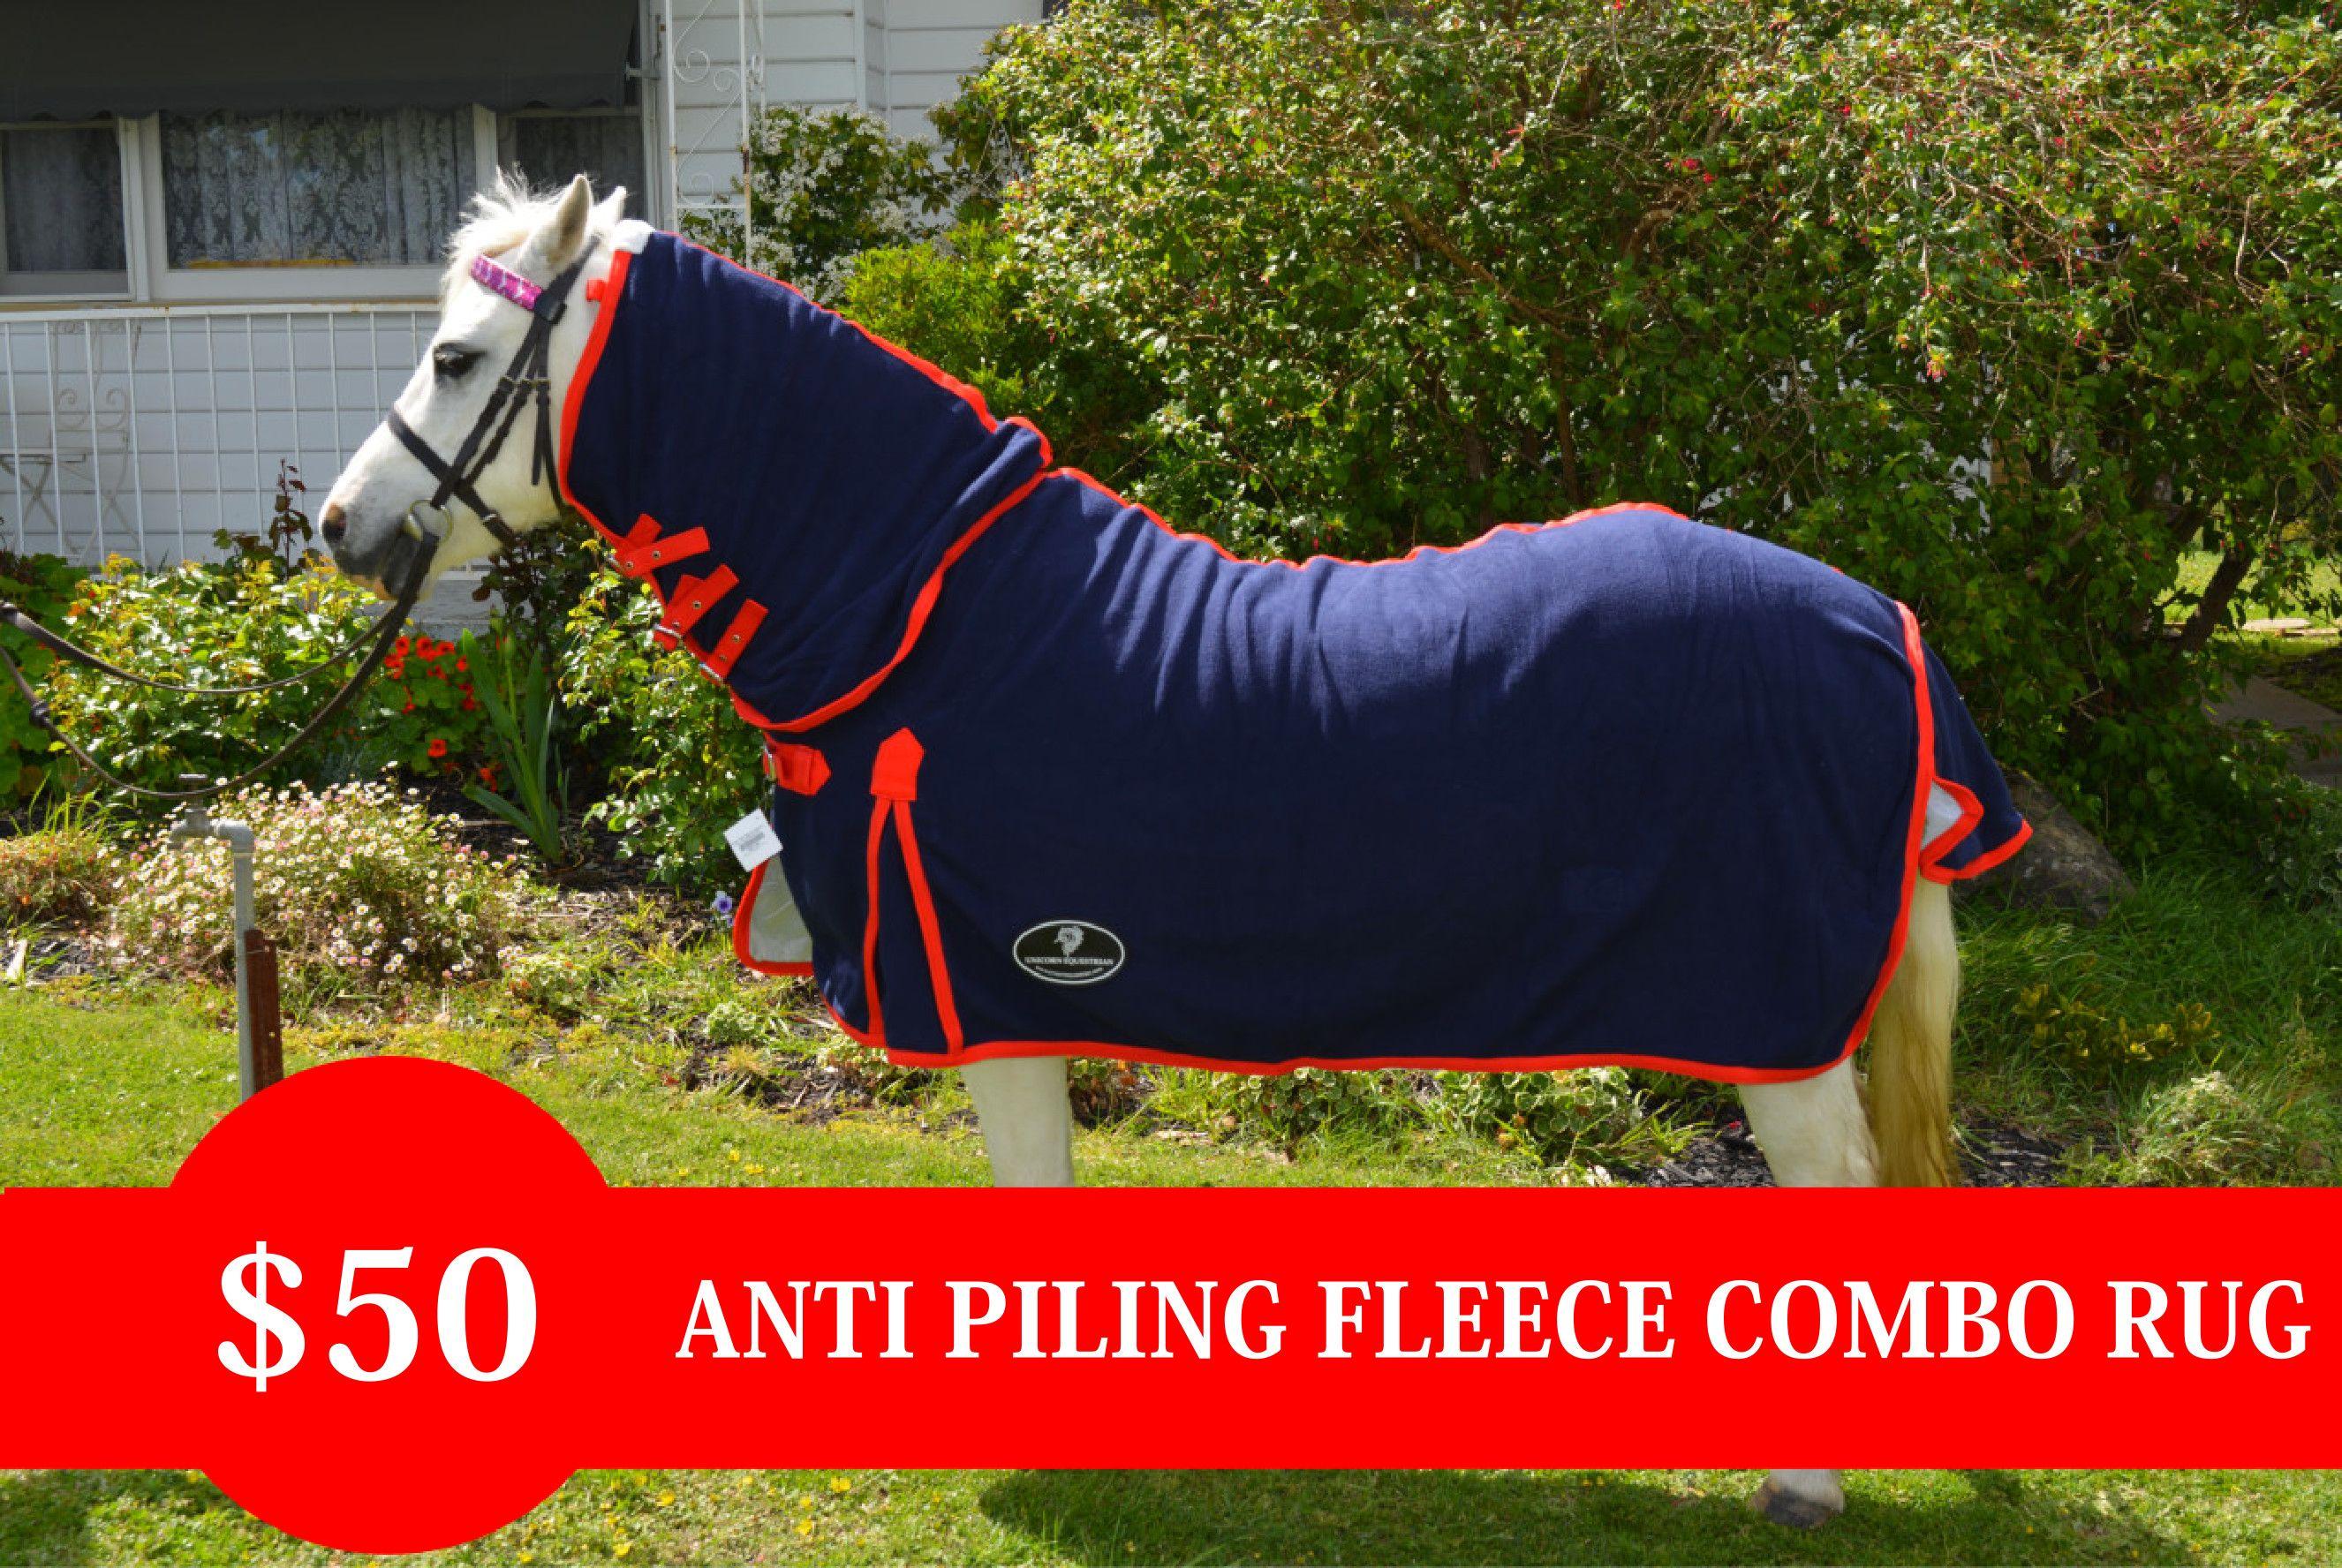 Miniature Antipiling Combo Fleece Rug